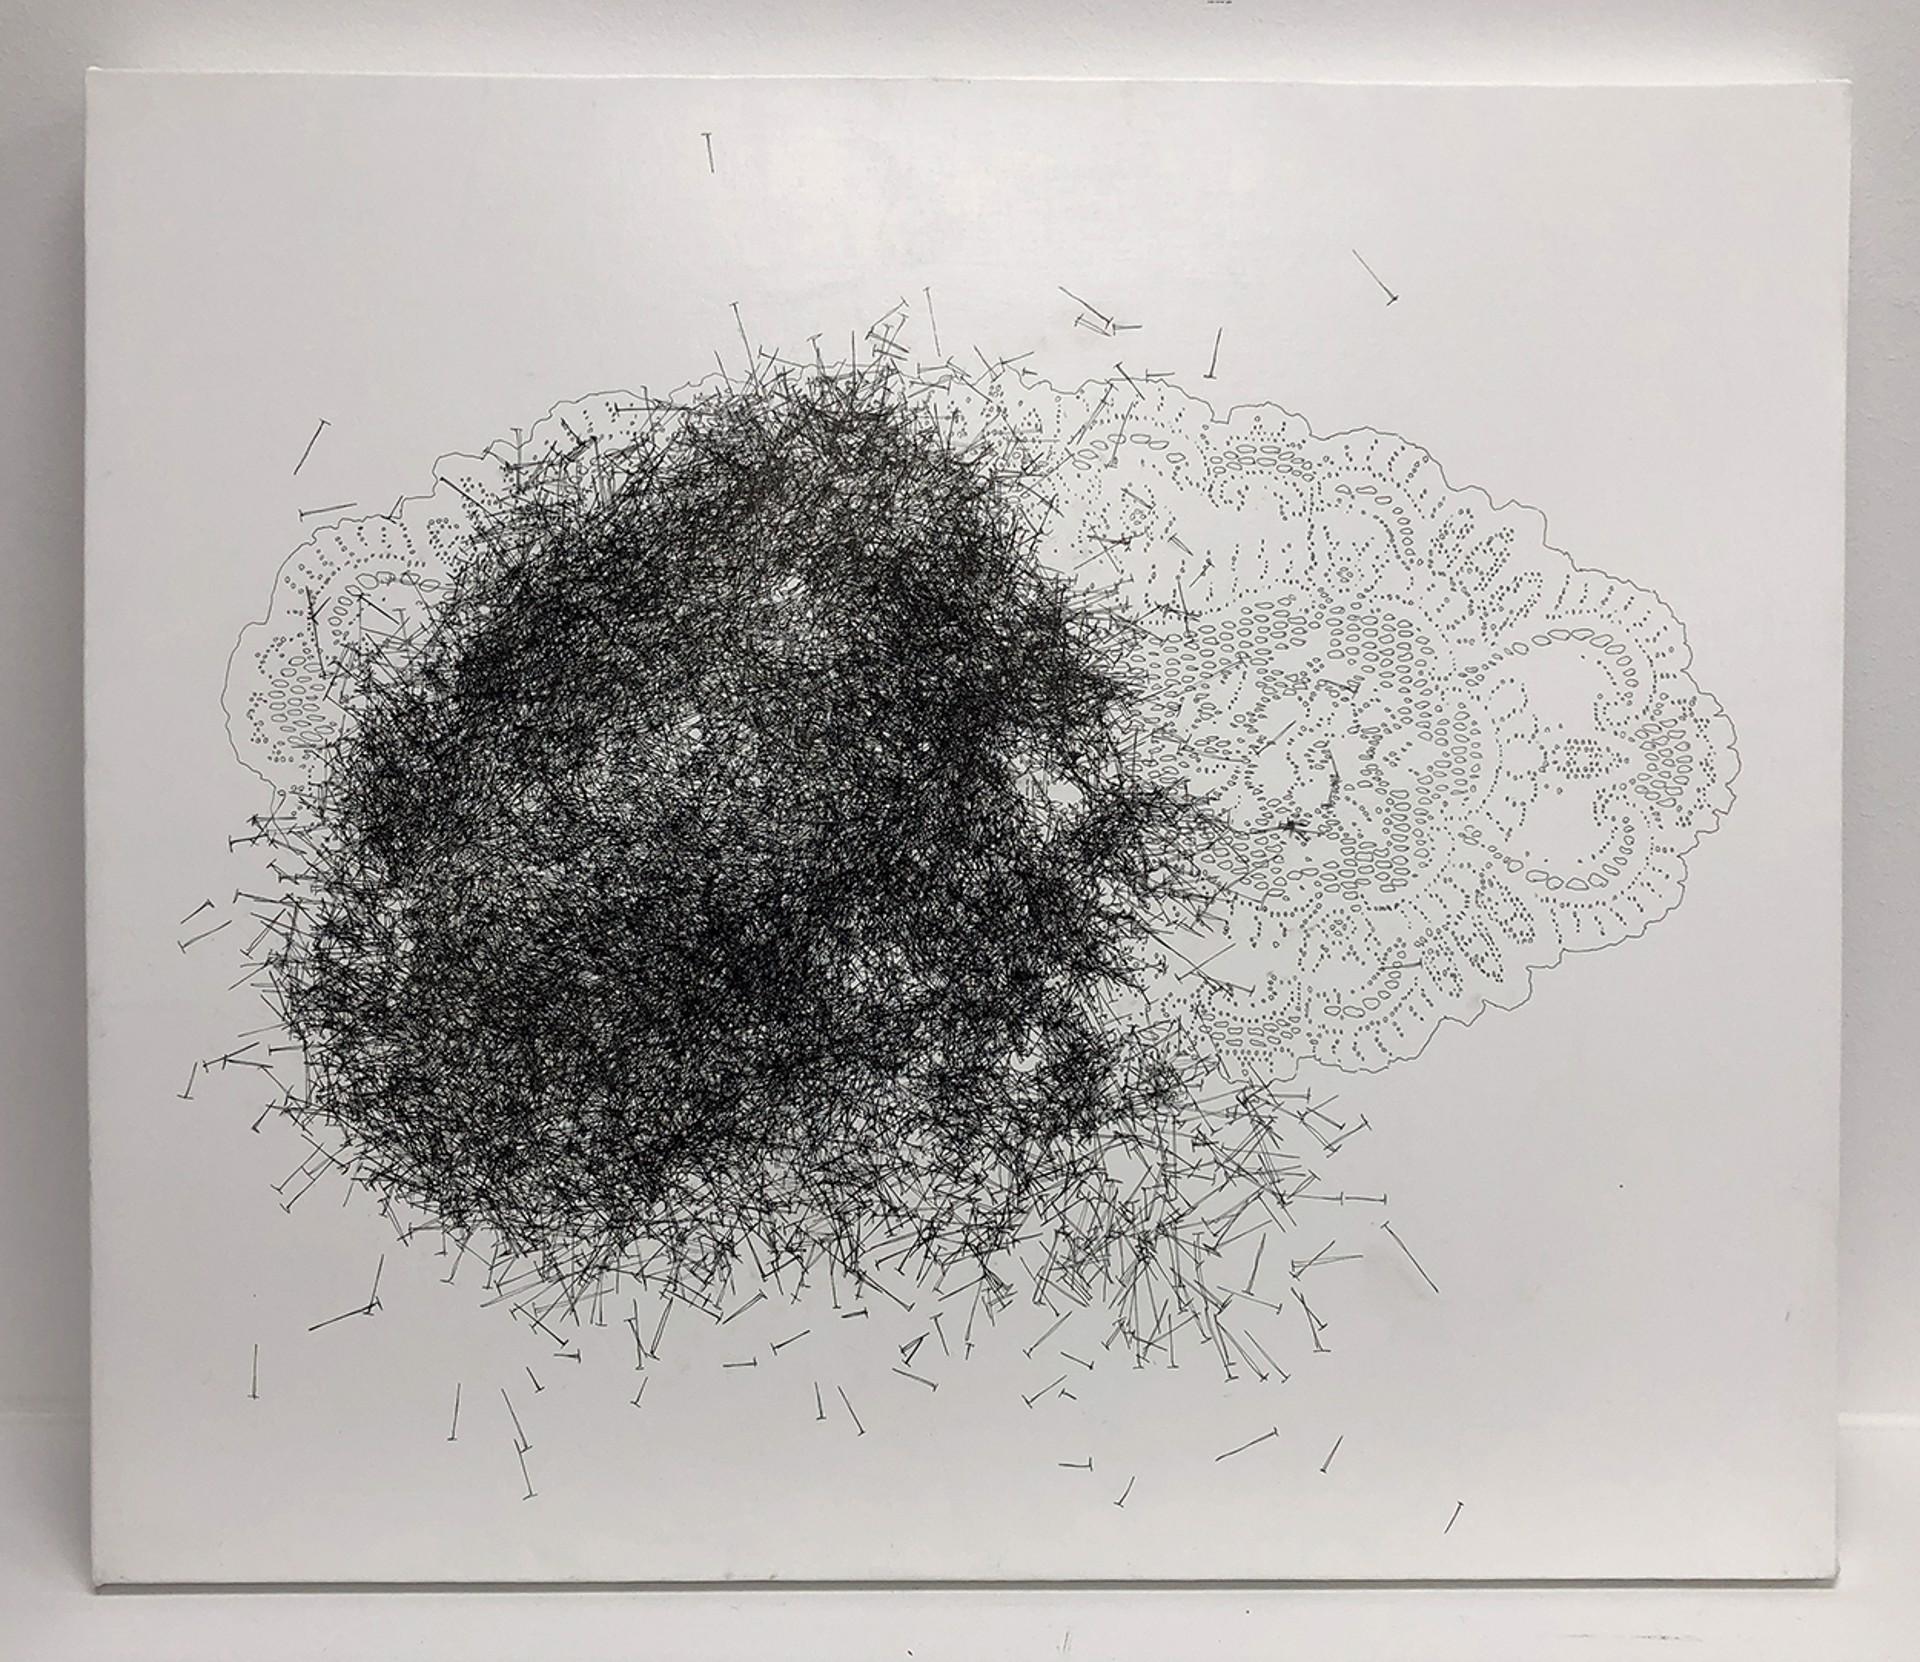 9,354 Nails by John Adelman